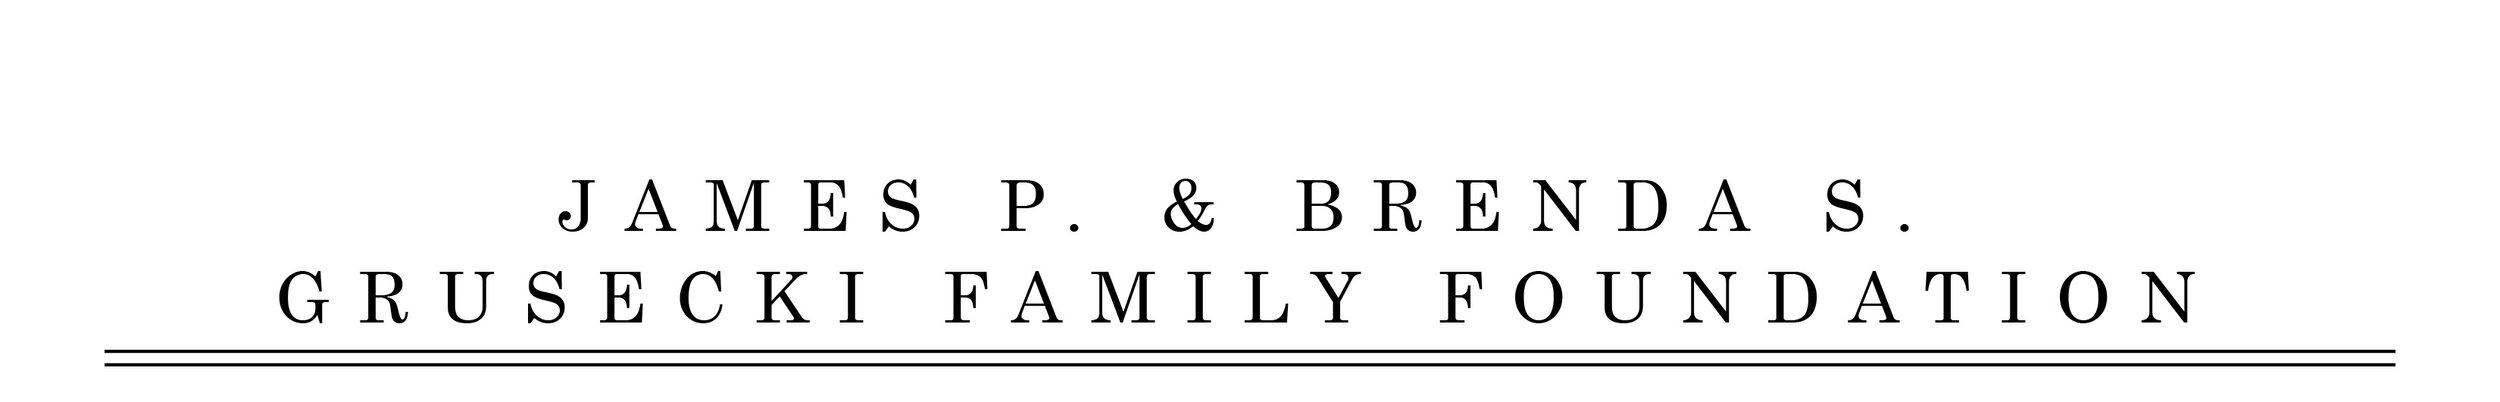 JAMES P. & BRENDA S. GRUSECKI FAMILY FOUNDATION